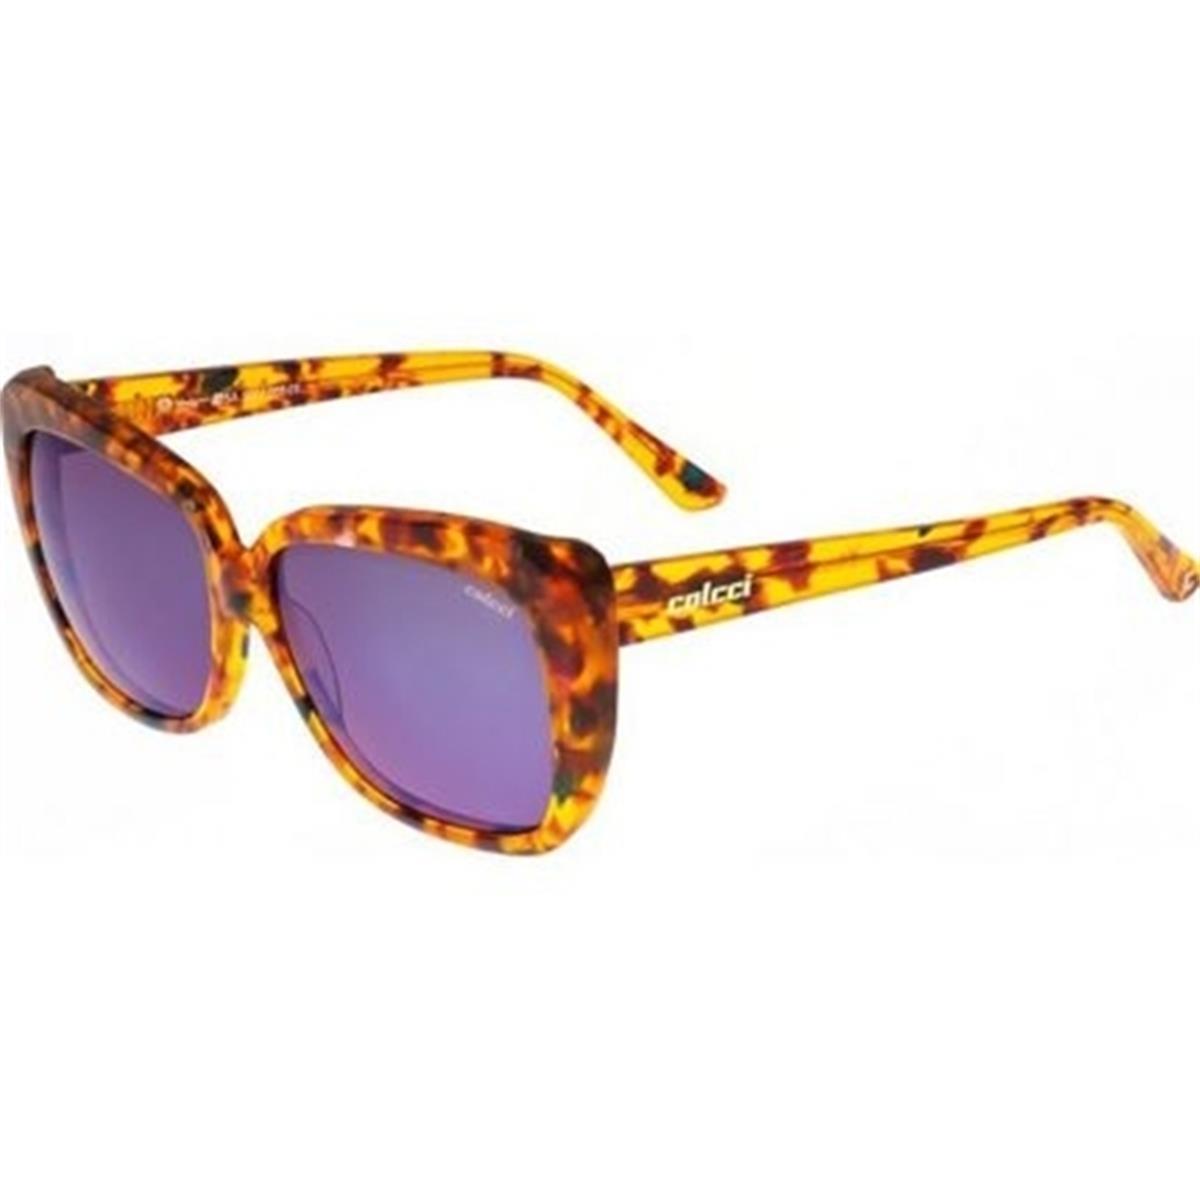 7f5678ded95fc 4362026 oculos-de-sol-feminino-demi-claro-lente-azul-5001-colcci Z1.jpg